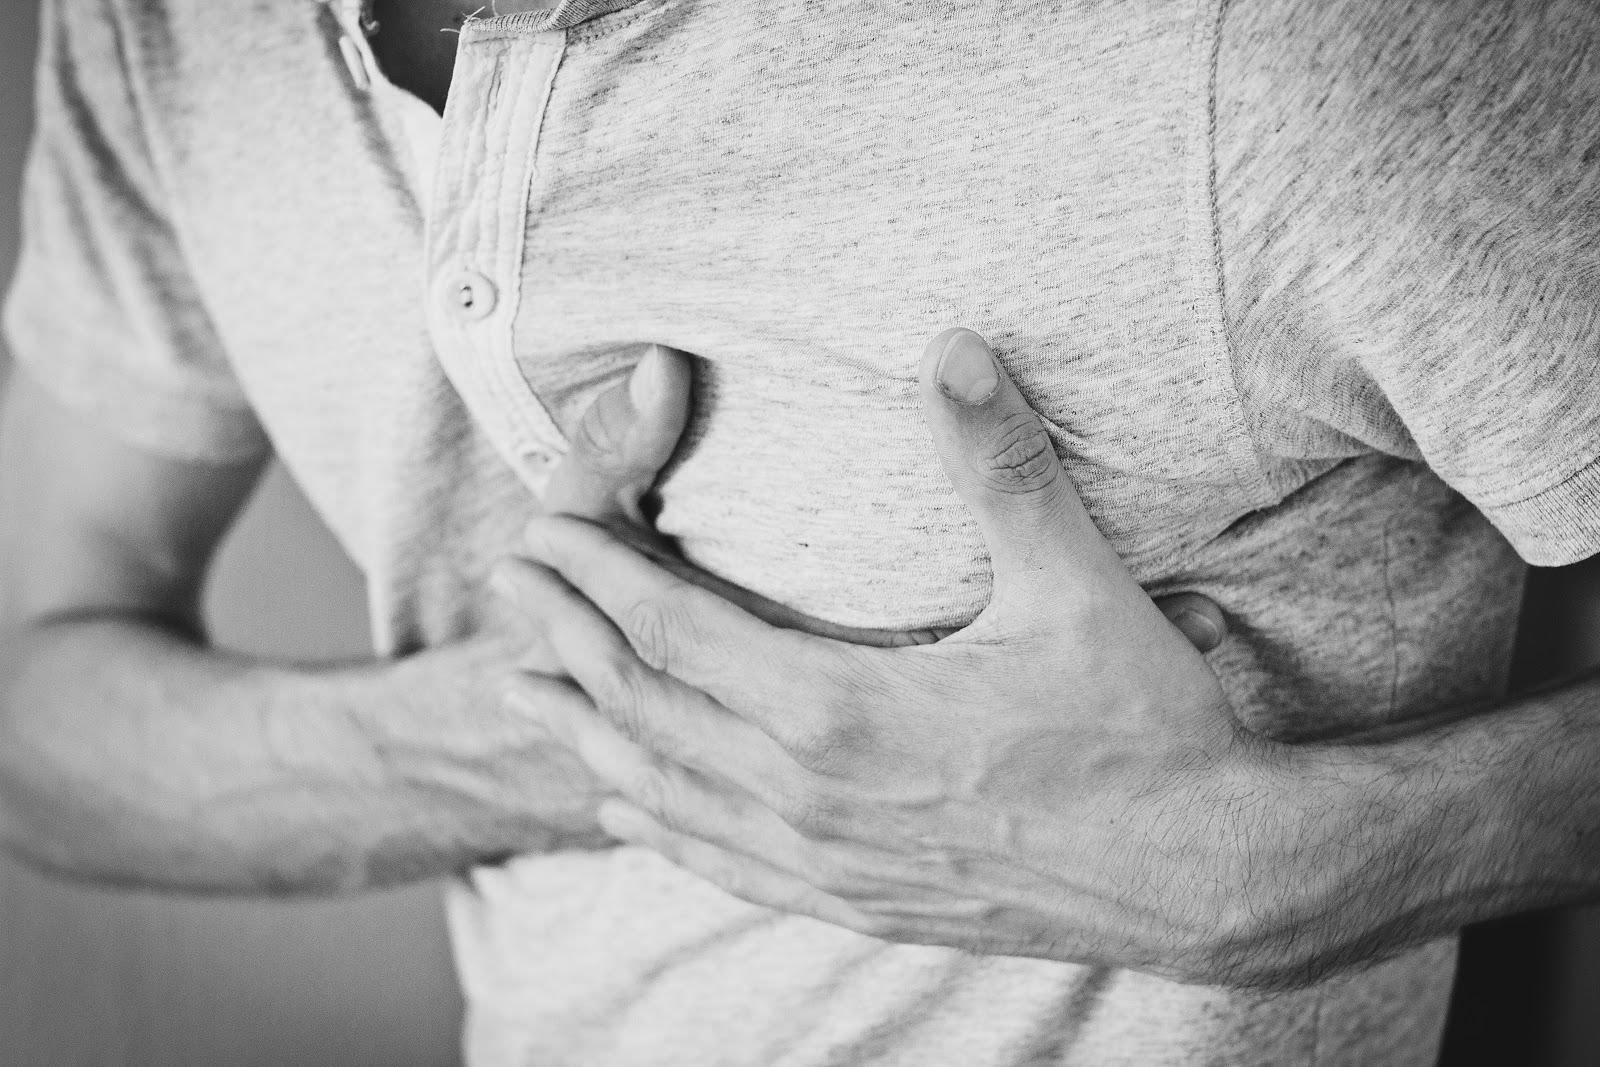 Viagra and heart disease